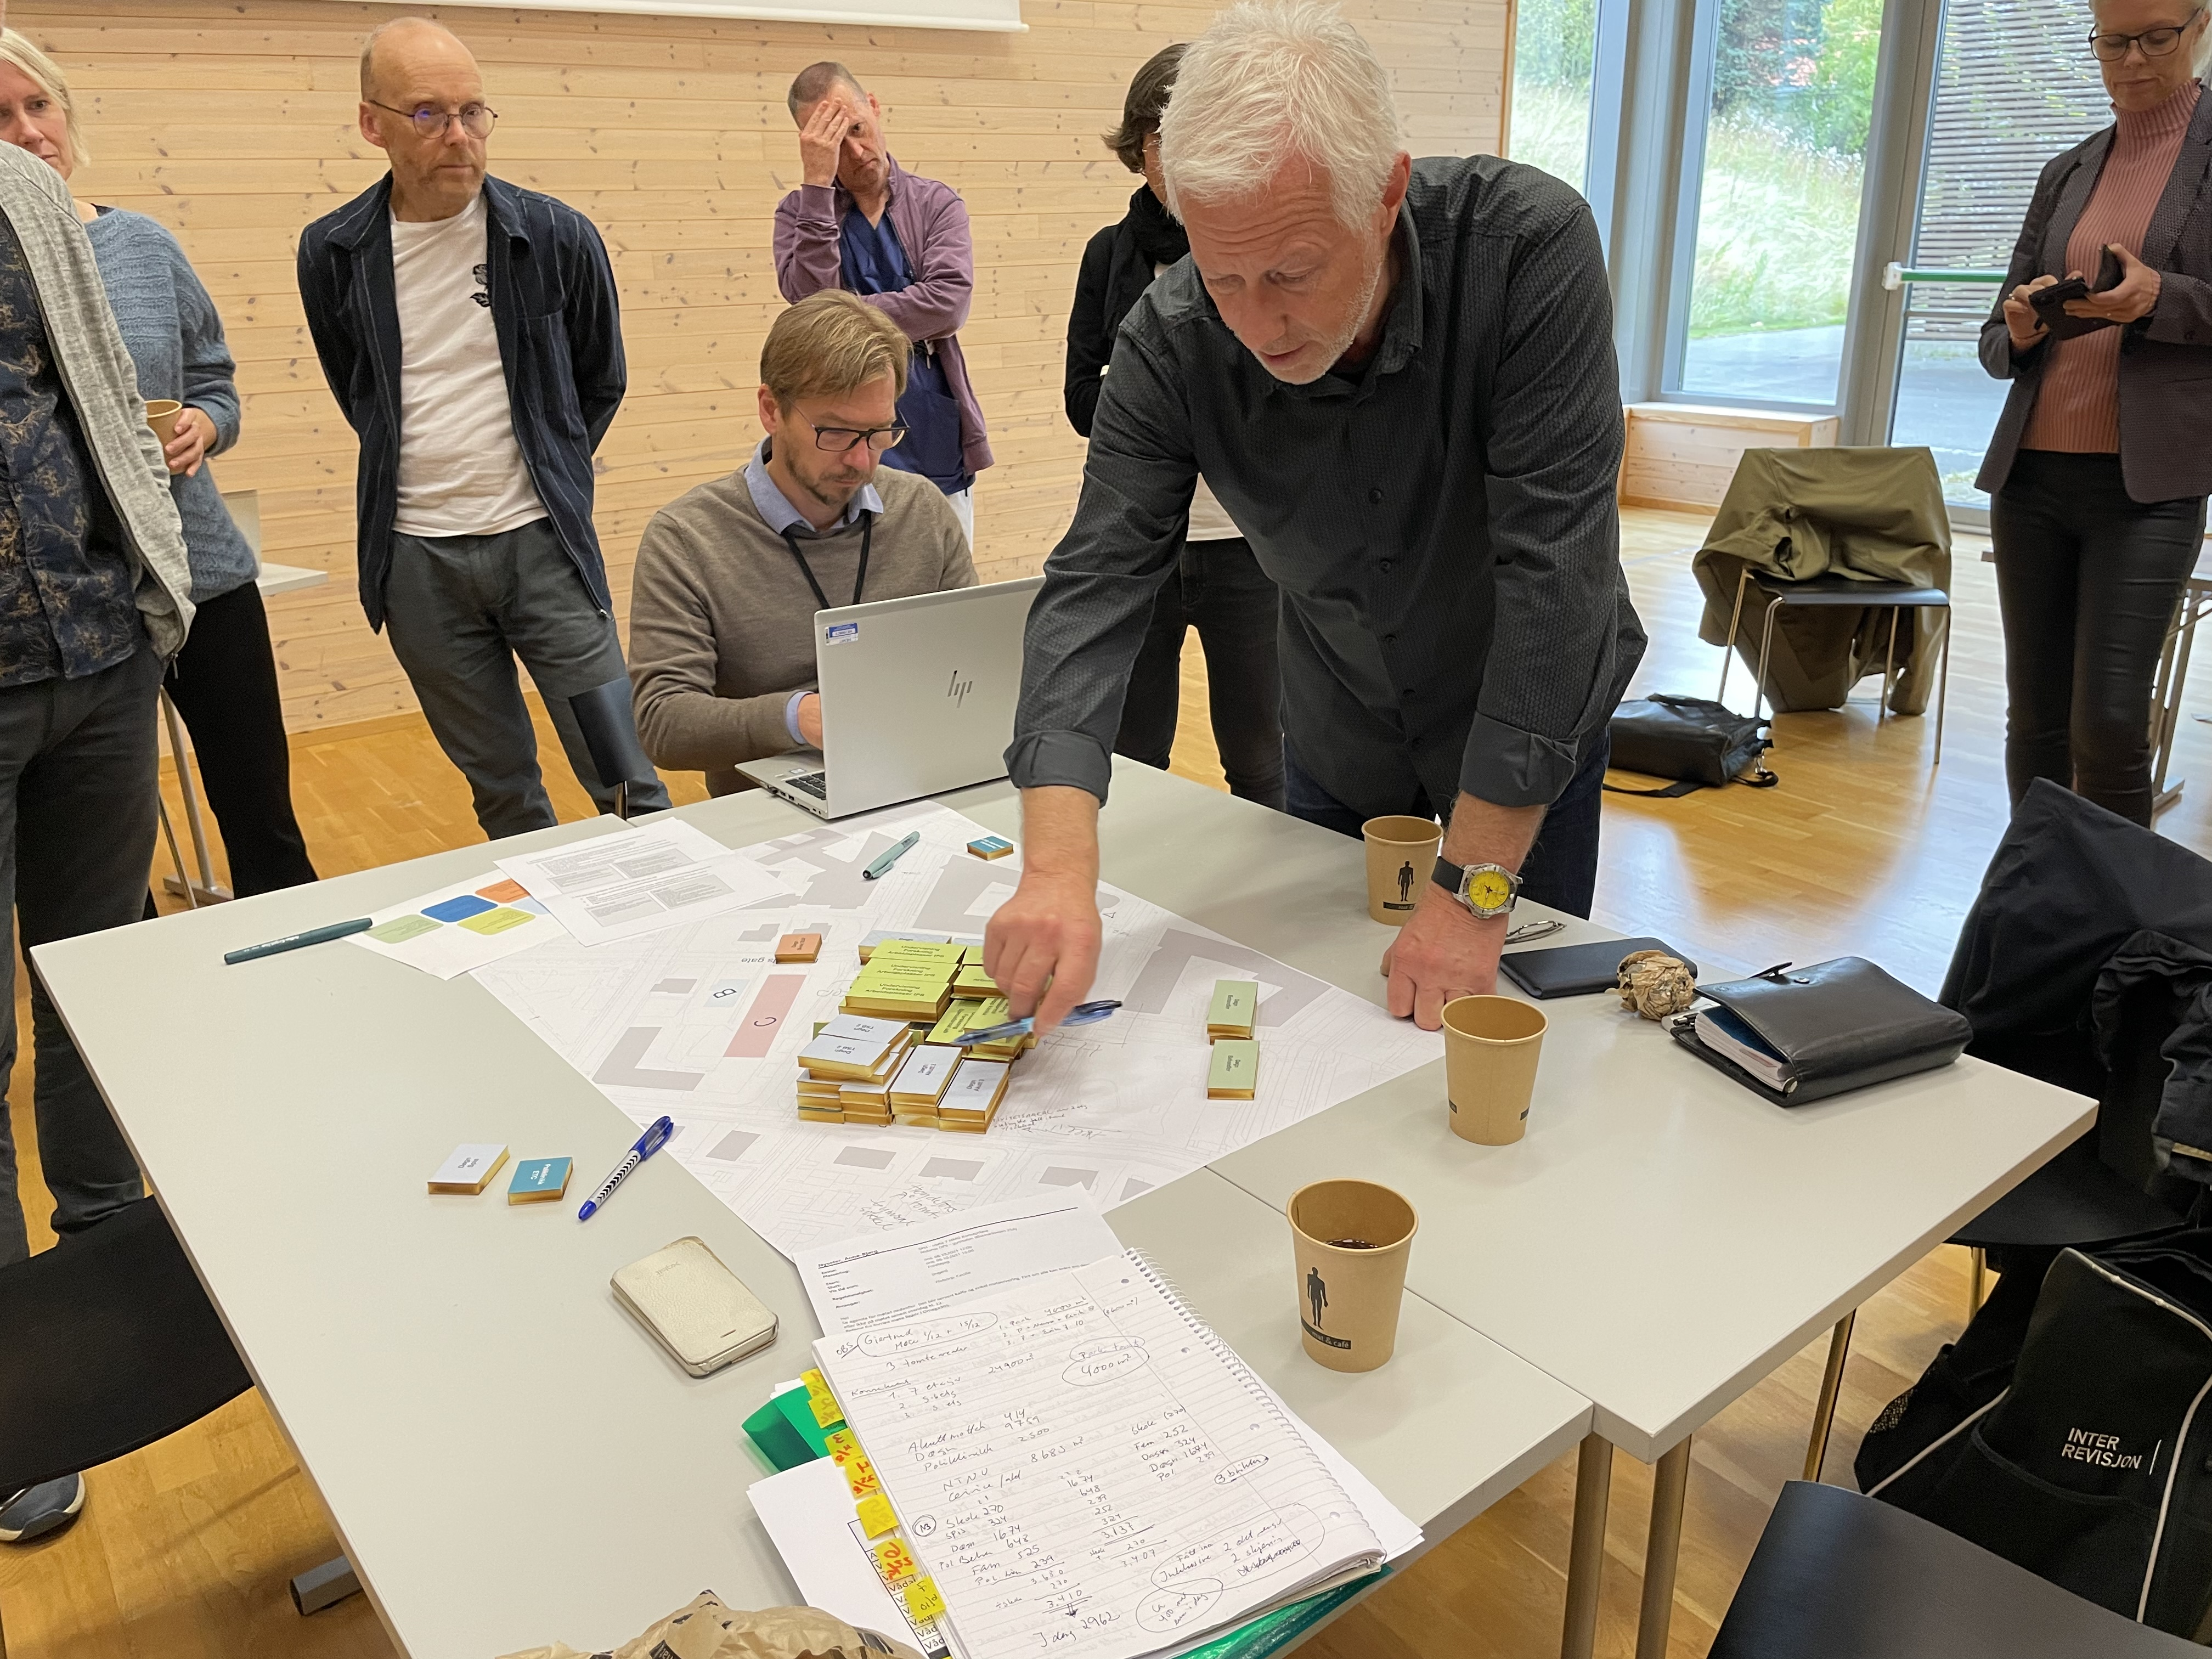 Hovedverneombud Geir Tranø peker og forklarer rundt klossene gruppa hans har bygd senter for psykisk helse med.